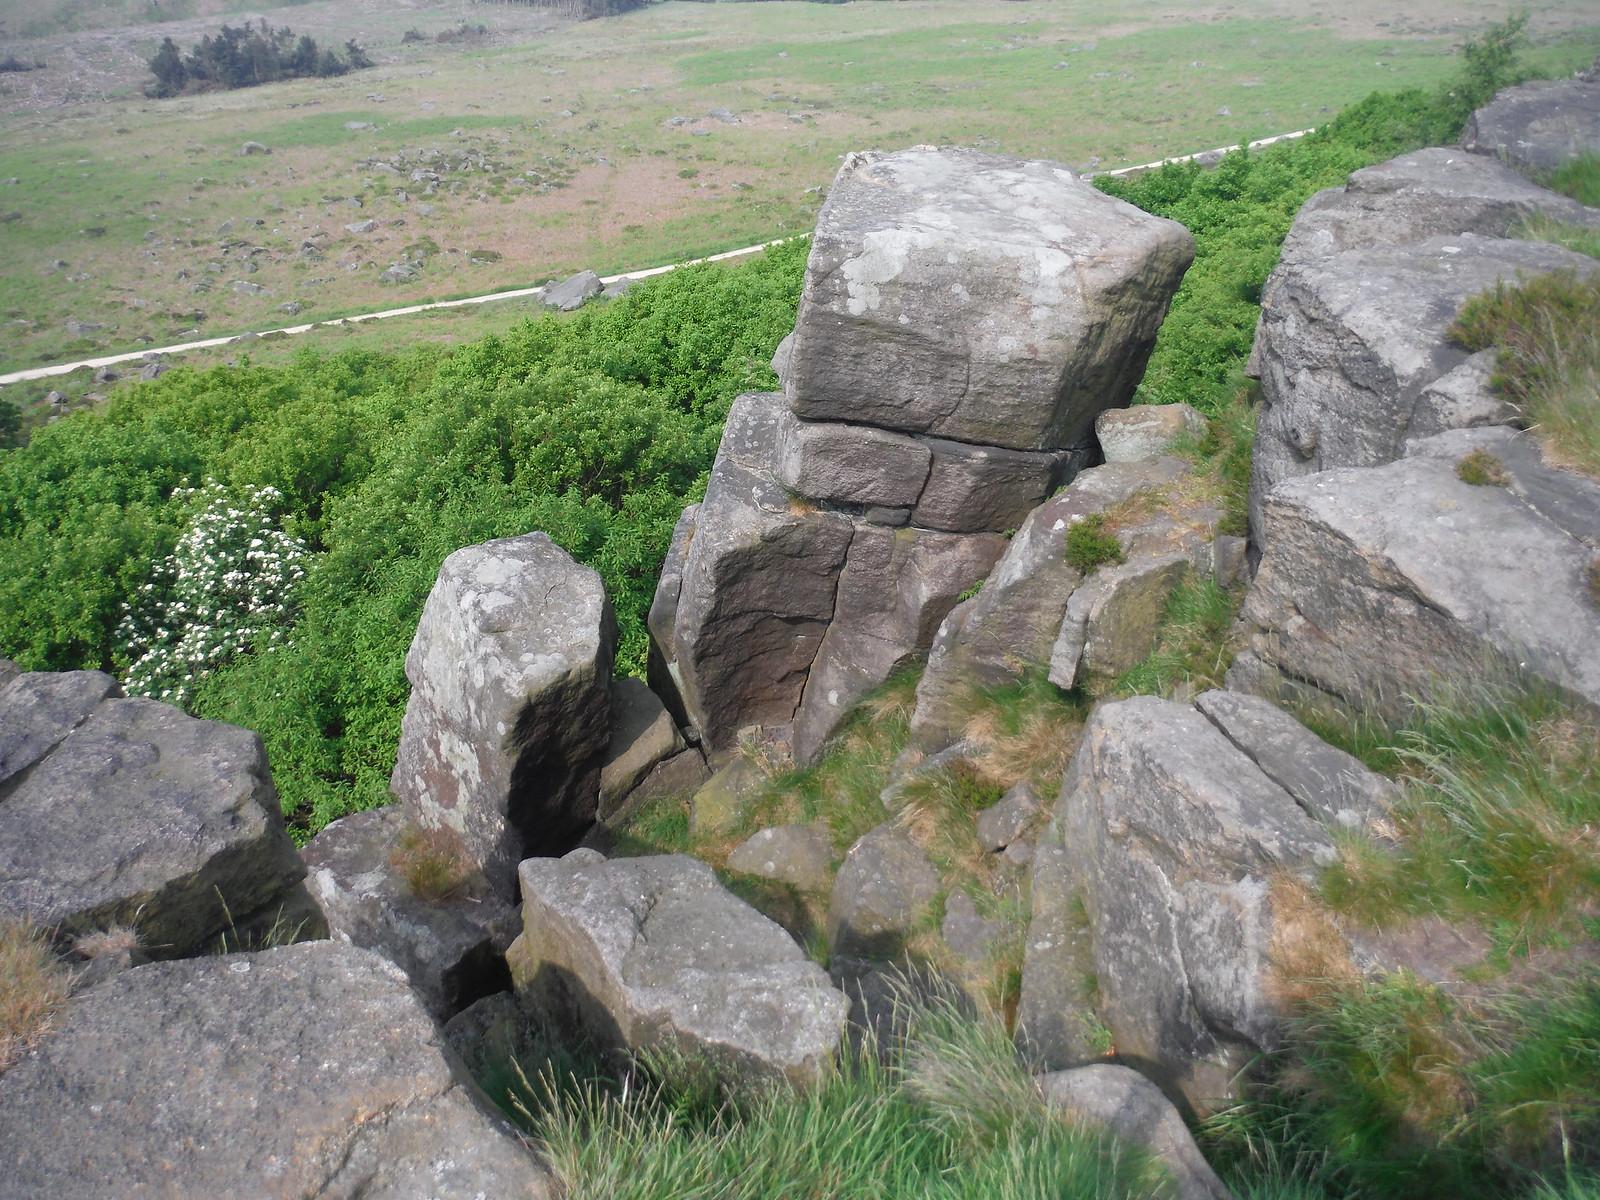 Rocks, Burbage Rocks SWC Walk 266 - Sheffield to Bamford (via Burbage Rocks and Stanage Edge) or to Moscar Lodge